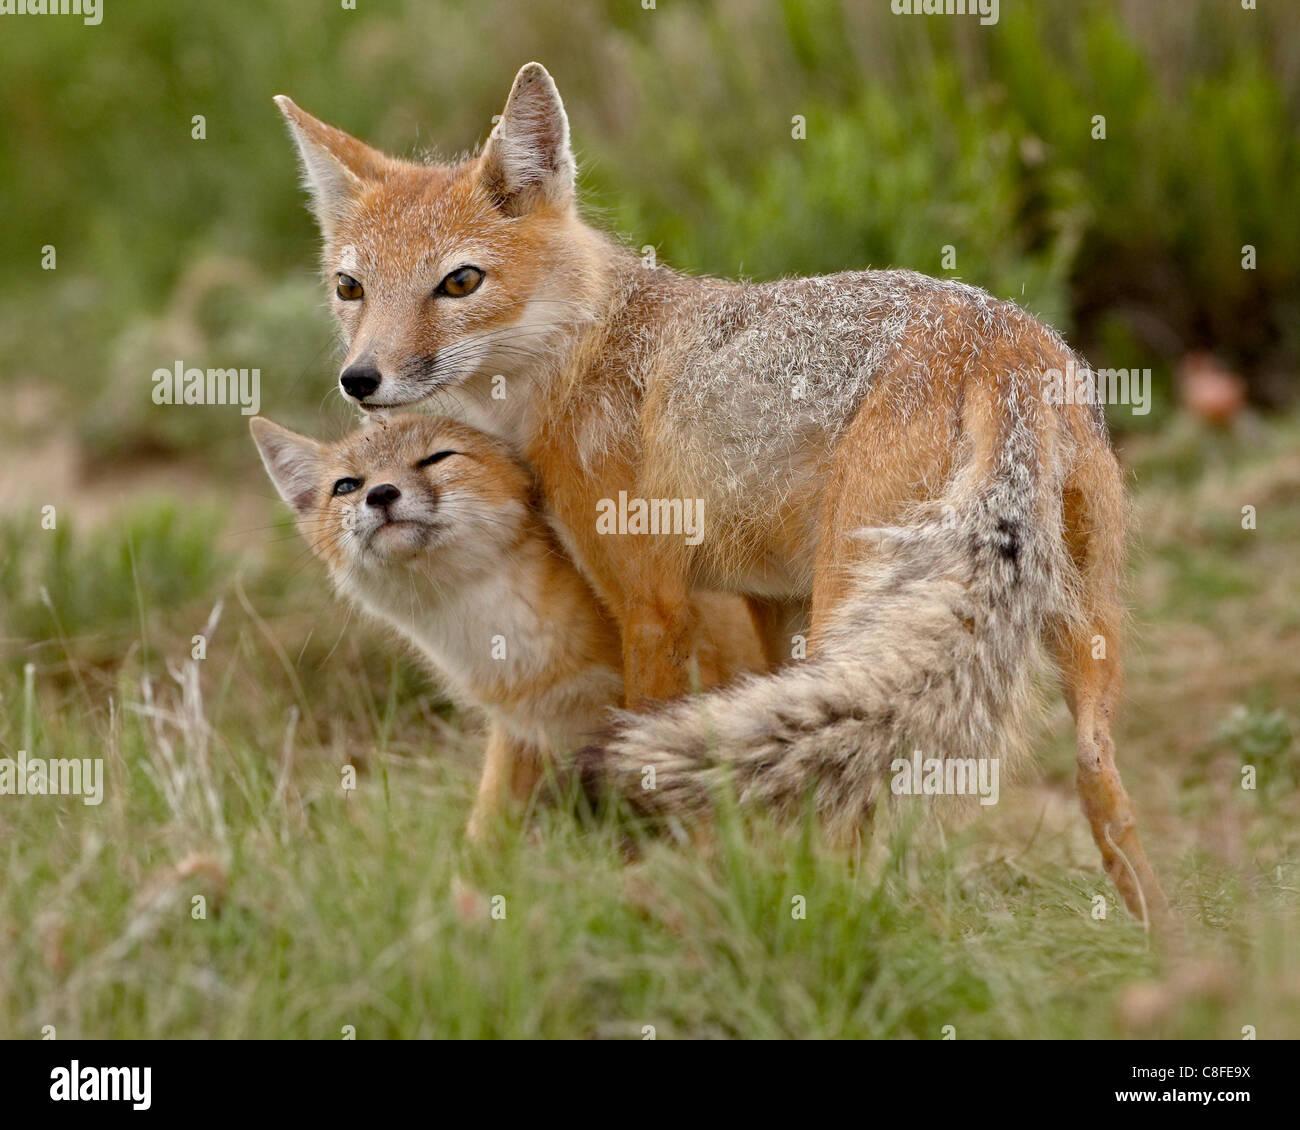 Swift fox (Vulpes velox) vixen and kit, Pawnee National Grassland, Colorado, United States of America - Stock Image